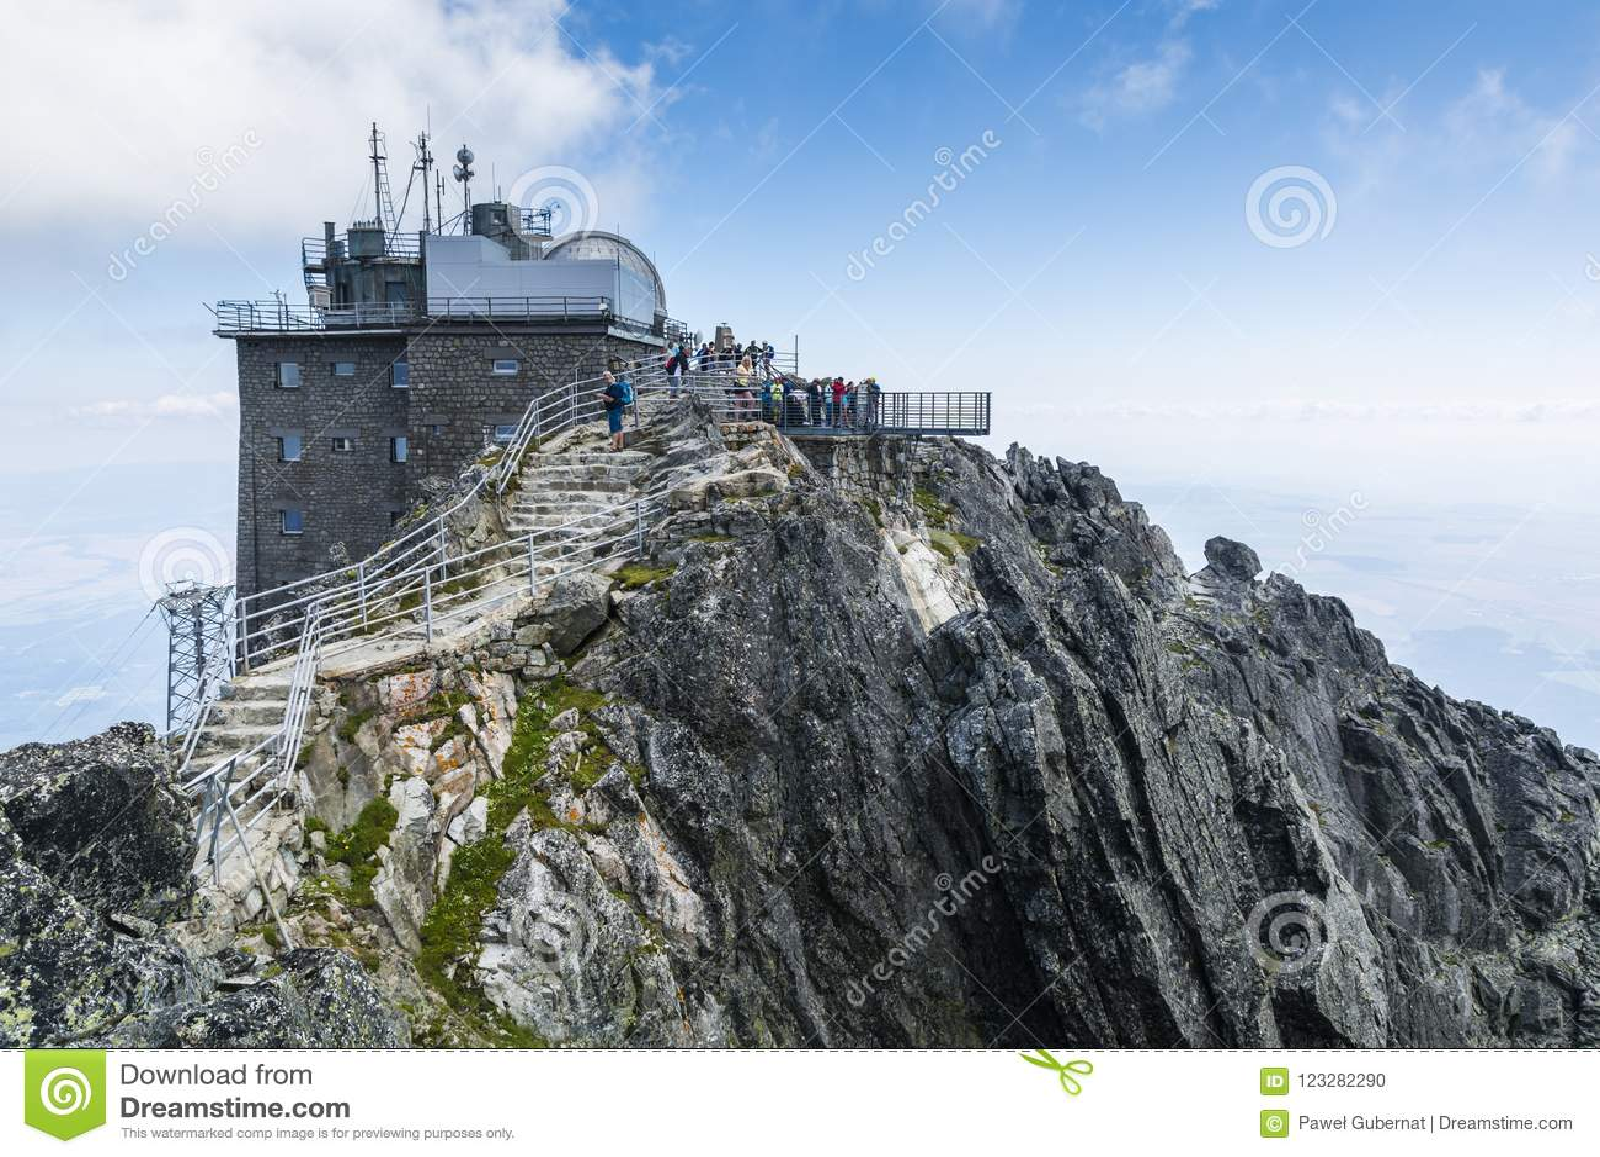 Observatory at Lomnica peak Observatorium na Lomnickom stite, Observatorium Lomnicky stit and tourists walking on viewing platfo